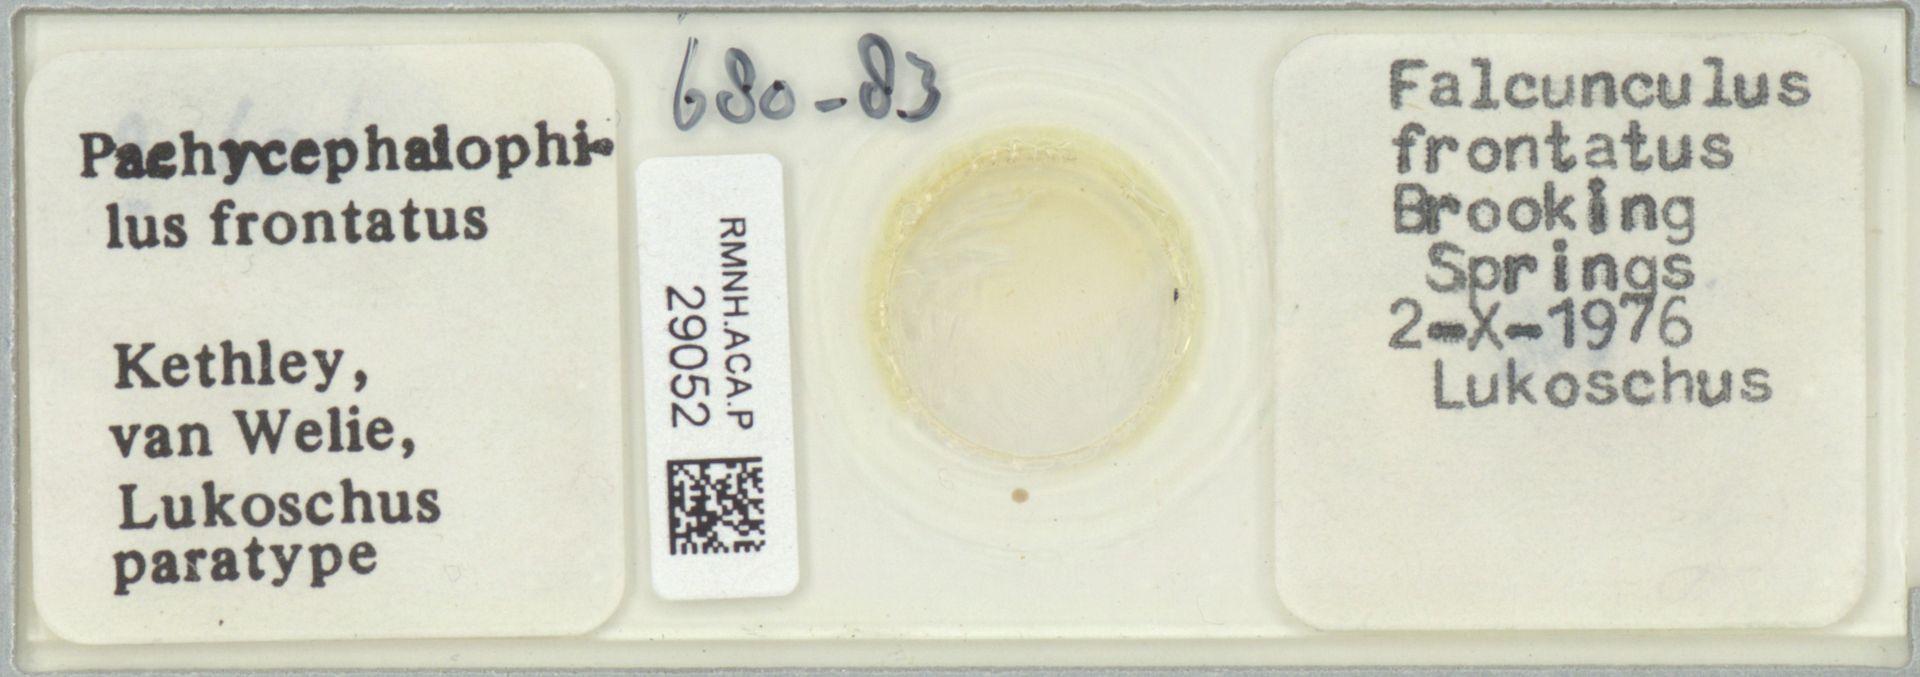 RMNH.ACA.P.29052 | Pachycephalophilus frontatus Kethley, van Welie, Lukoschus